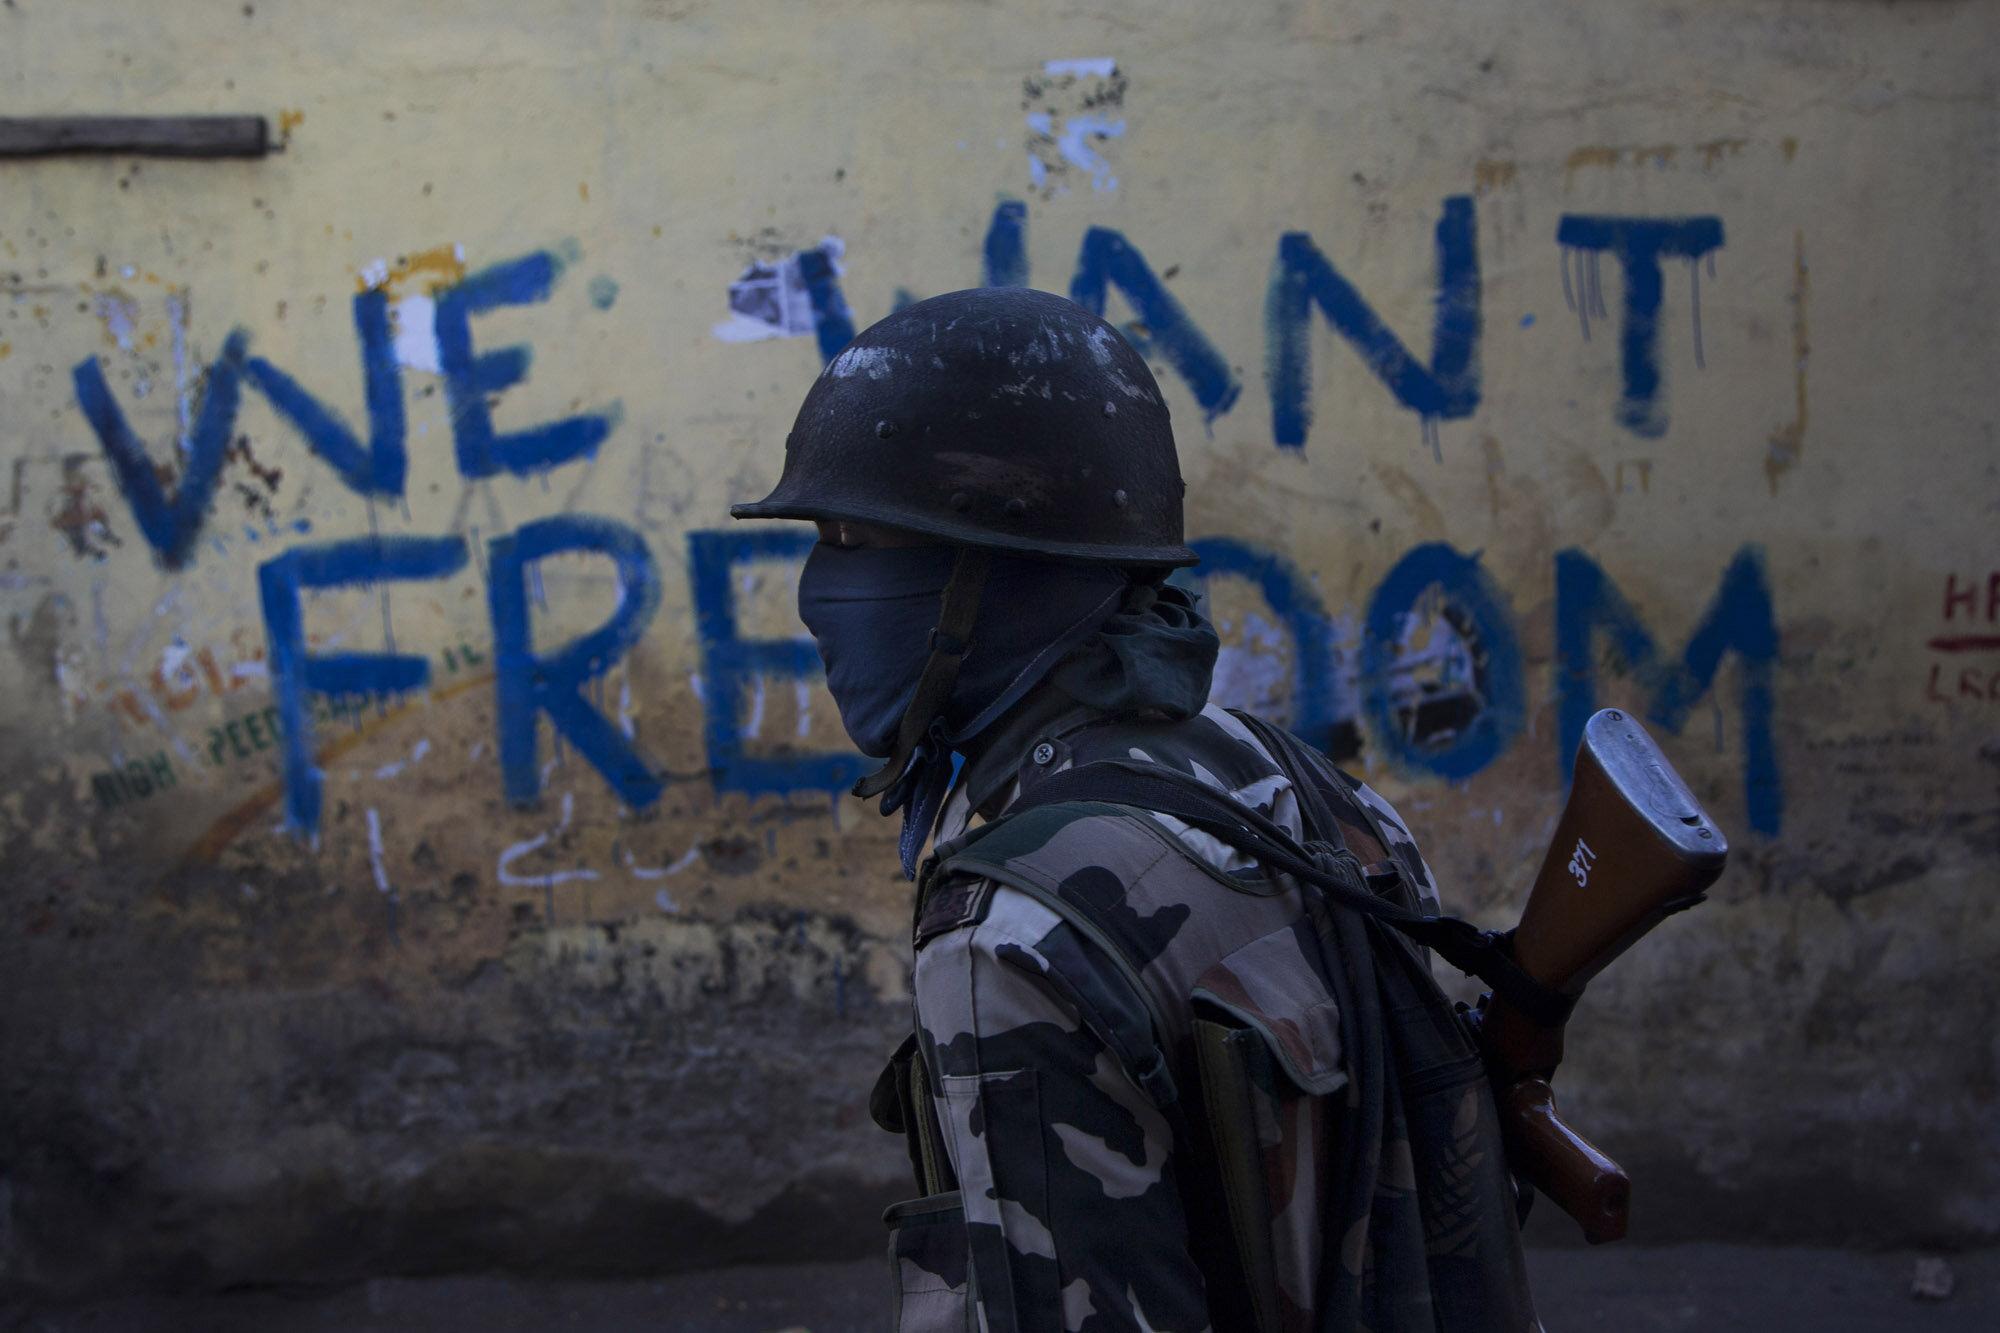 An Indian paramilitary soldier walks past graffiti on a wall in Srinagar, Indian-controlled Kashmir, Aug. 29, 2016.(AP Photo/Dar Yasin)